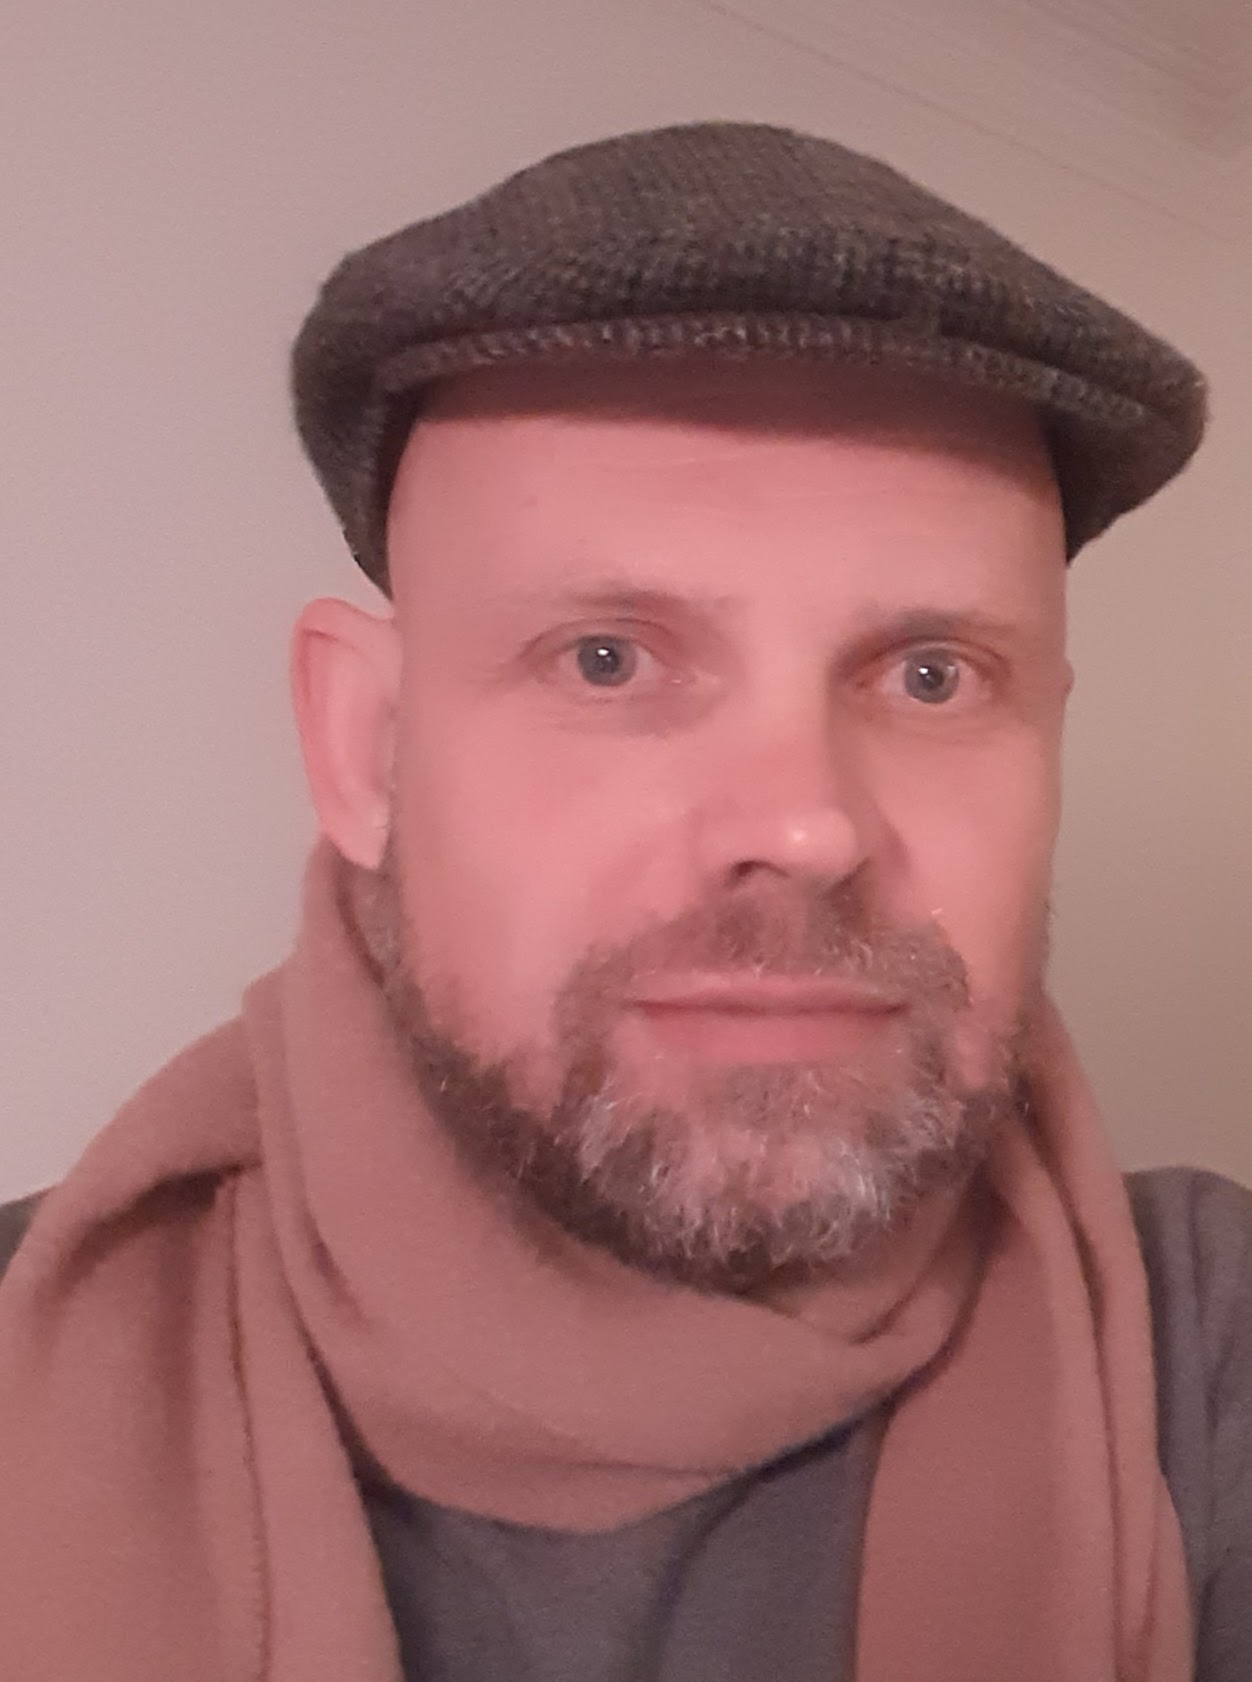 Henrik Jessen